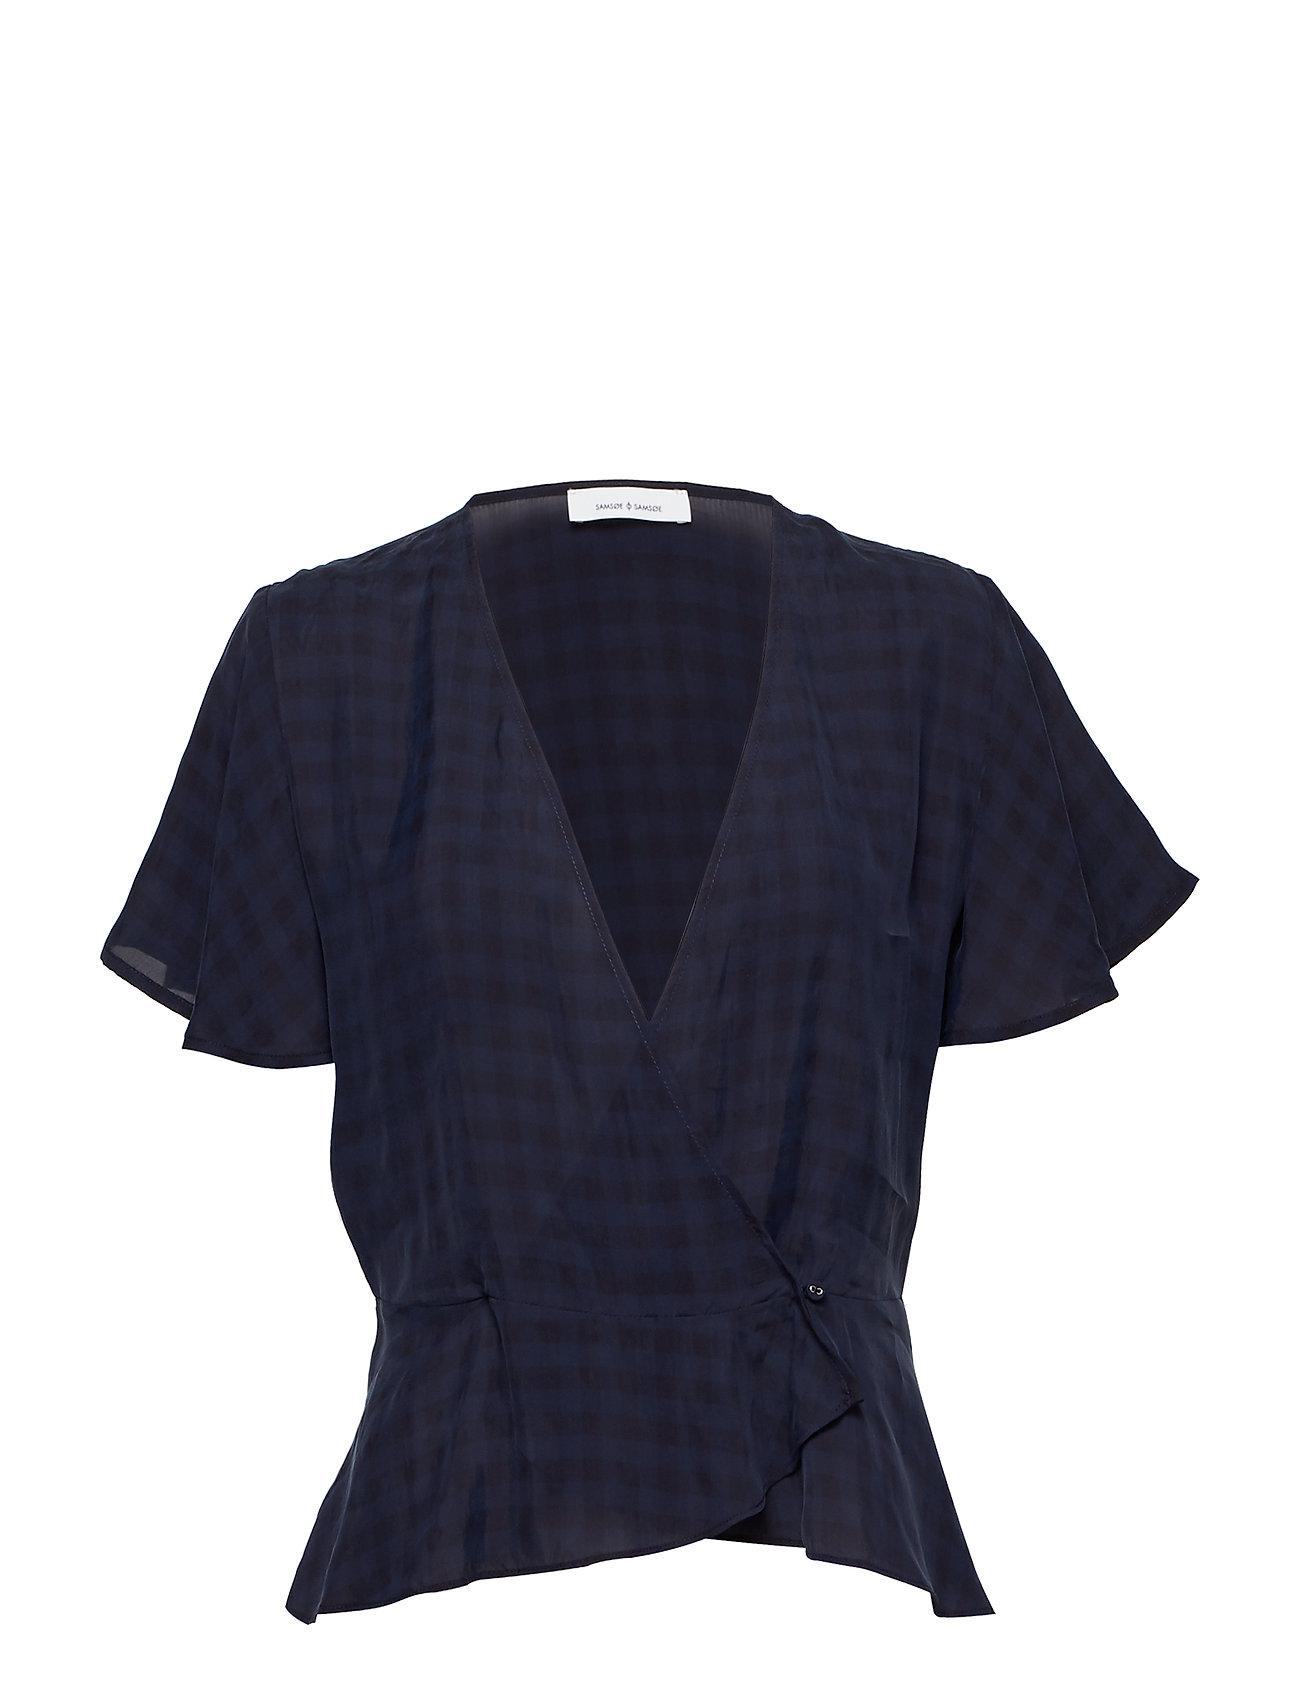 Samsøe & Samsøe Sylvi blouse ss 10851 - DARK SAPPHIRE